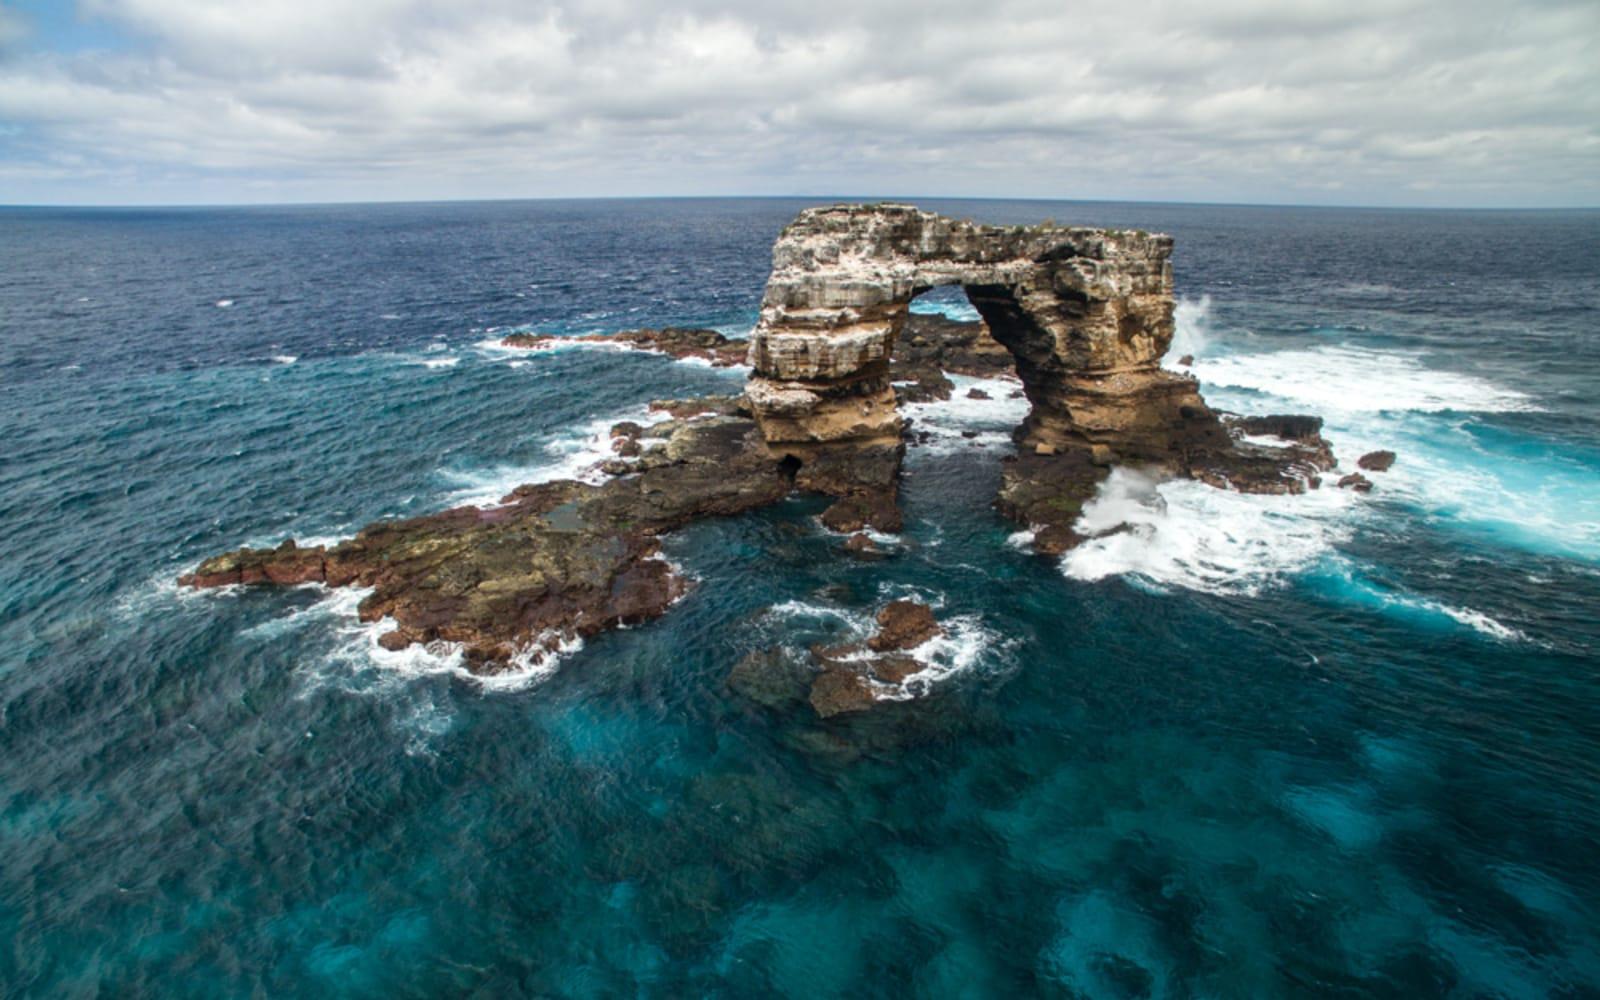 >Darwin's Arch, Galapagos